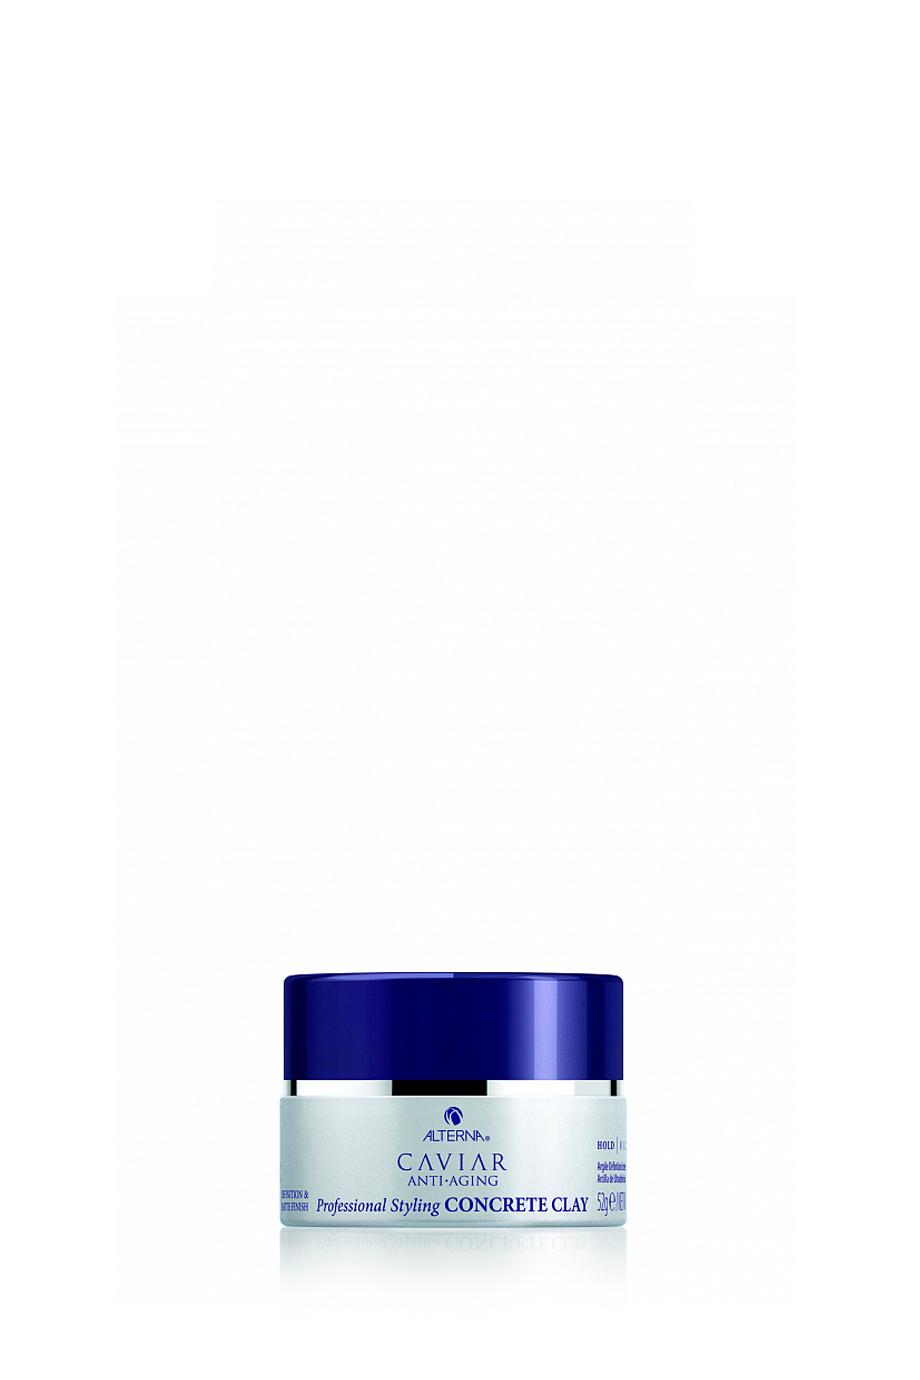 Caviar Anti-Aging Professional Styling Concrete Clay Дефинирующая глина сильной фиксации с антивозрастным уходом, 52 гр